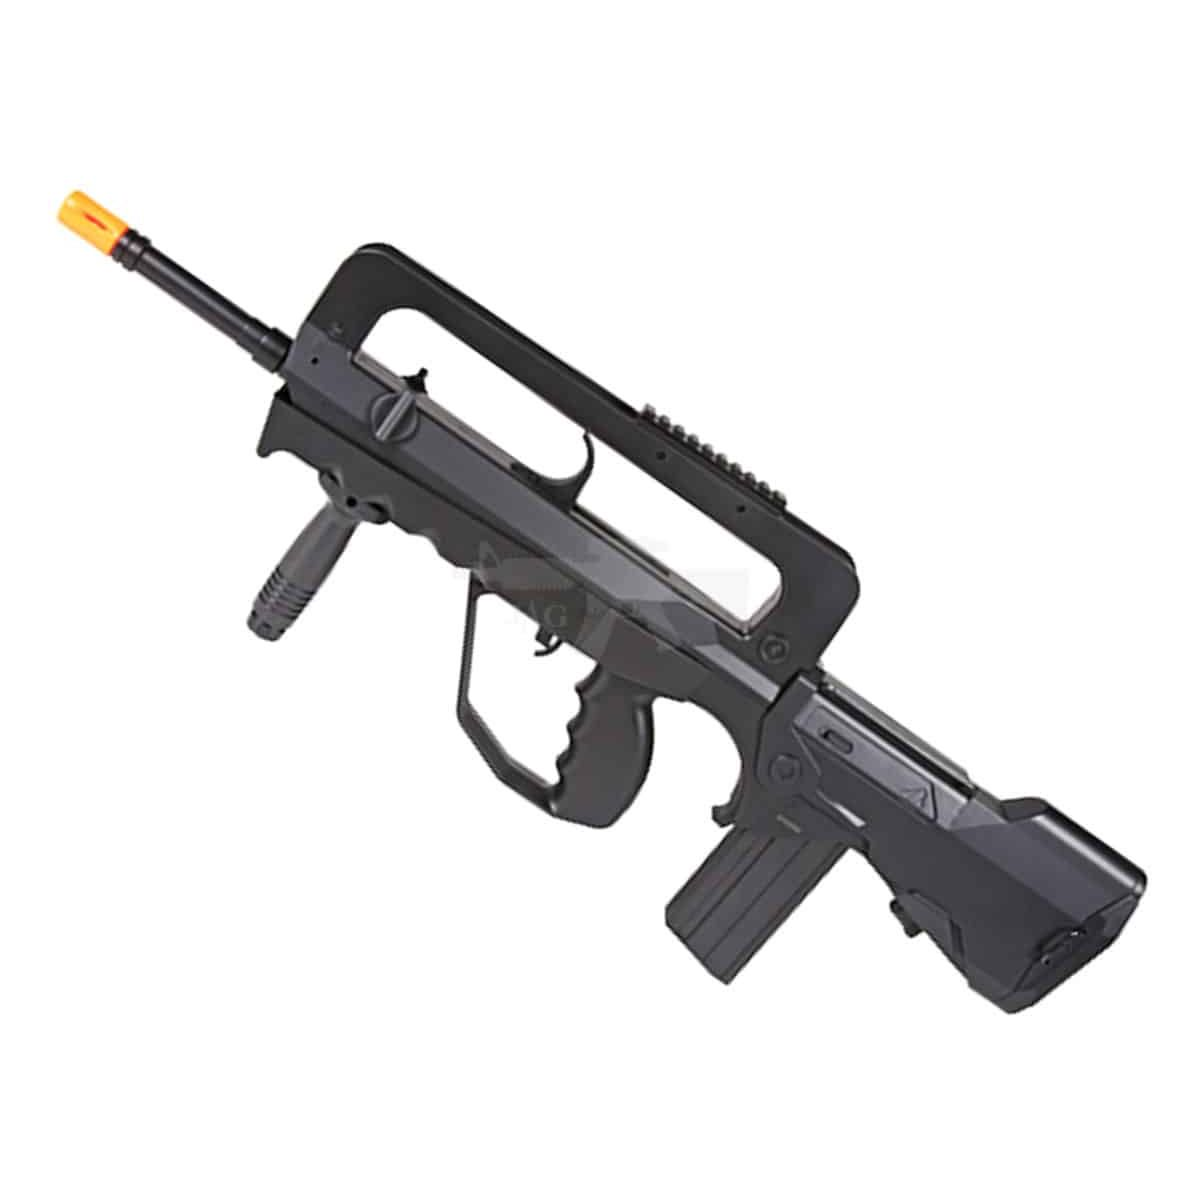 M308 MINI M16 SPRING AIRSOFT RIFLE